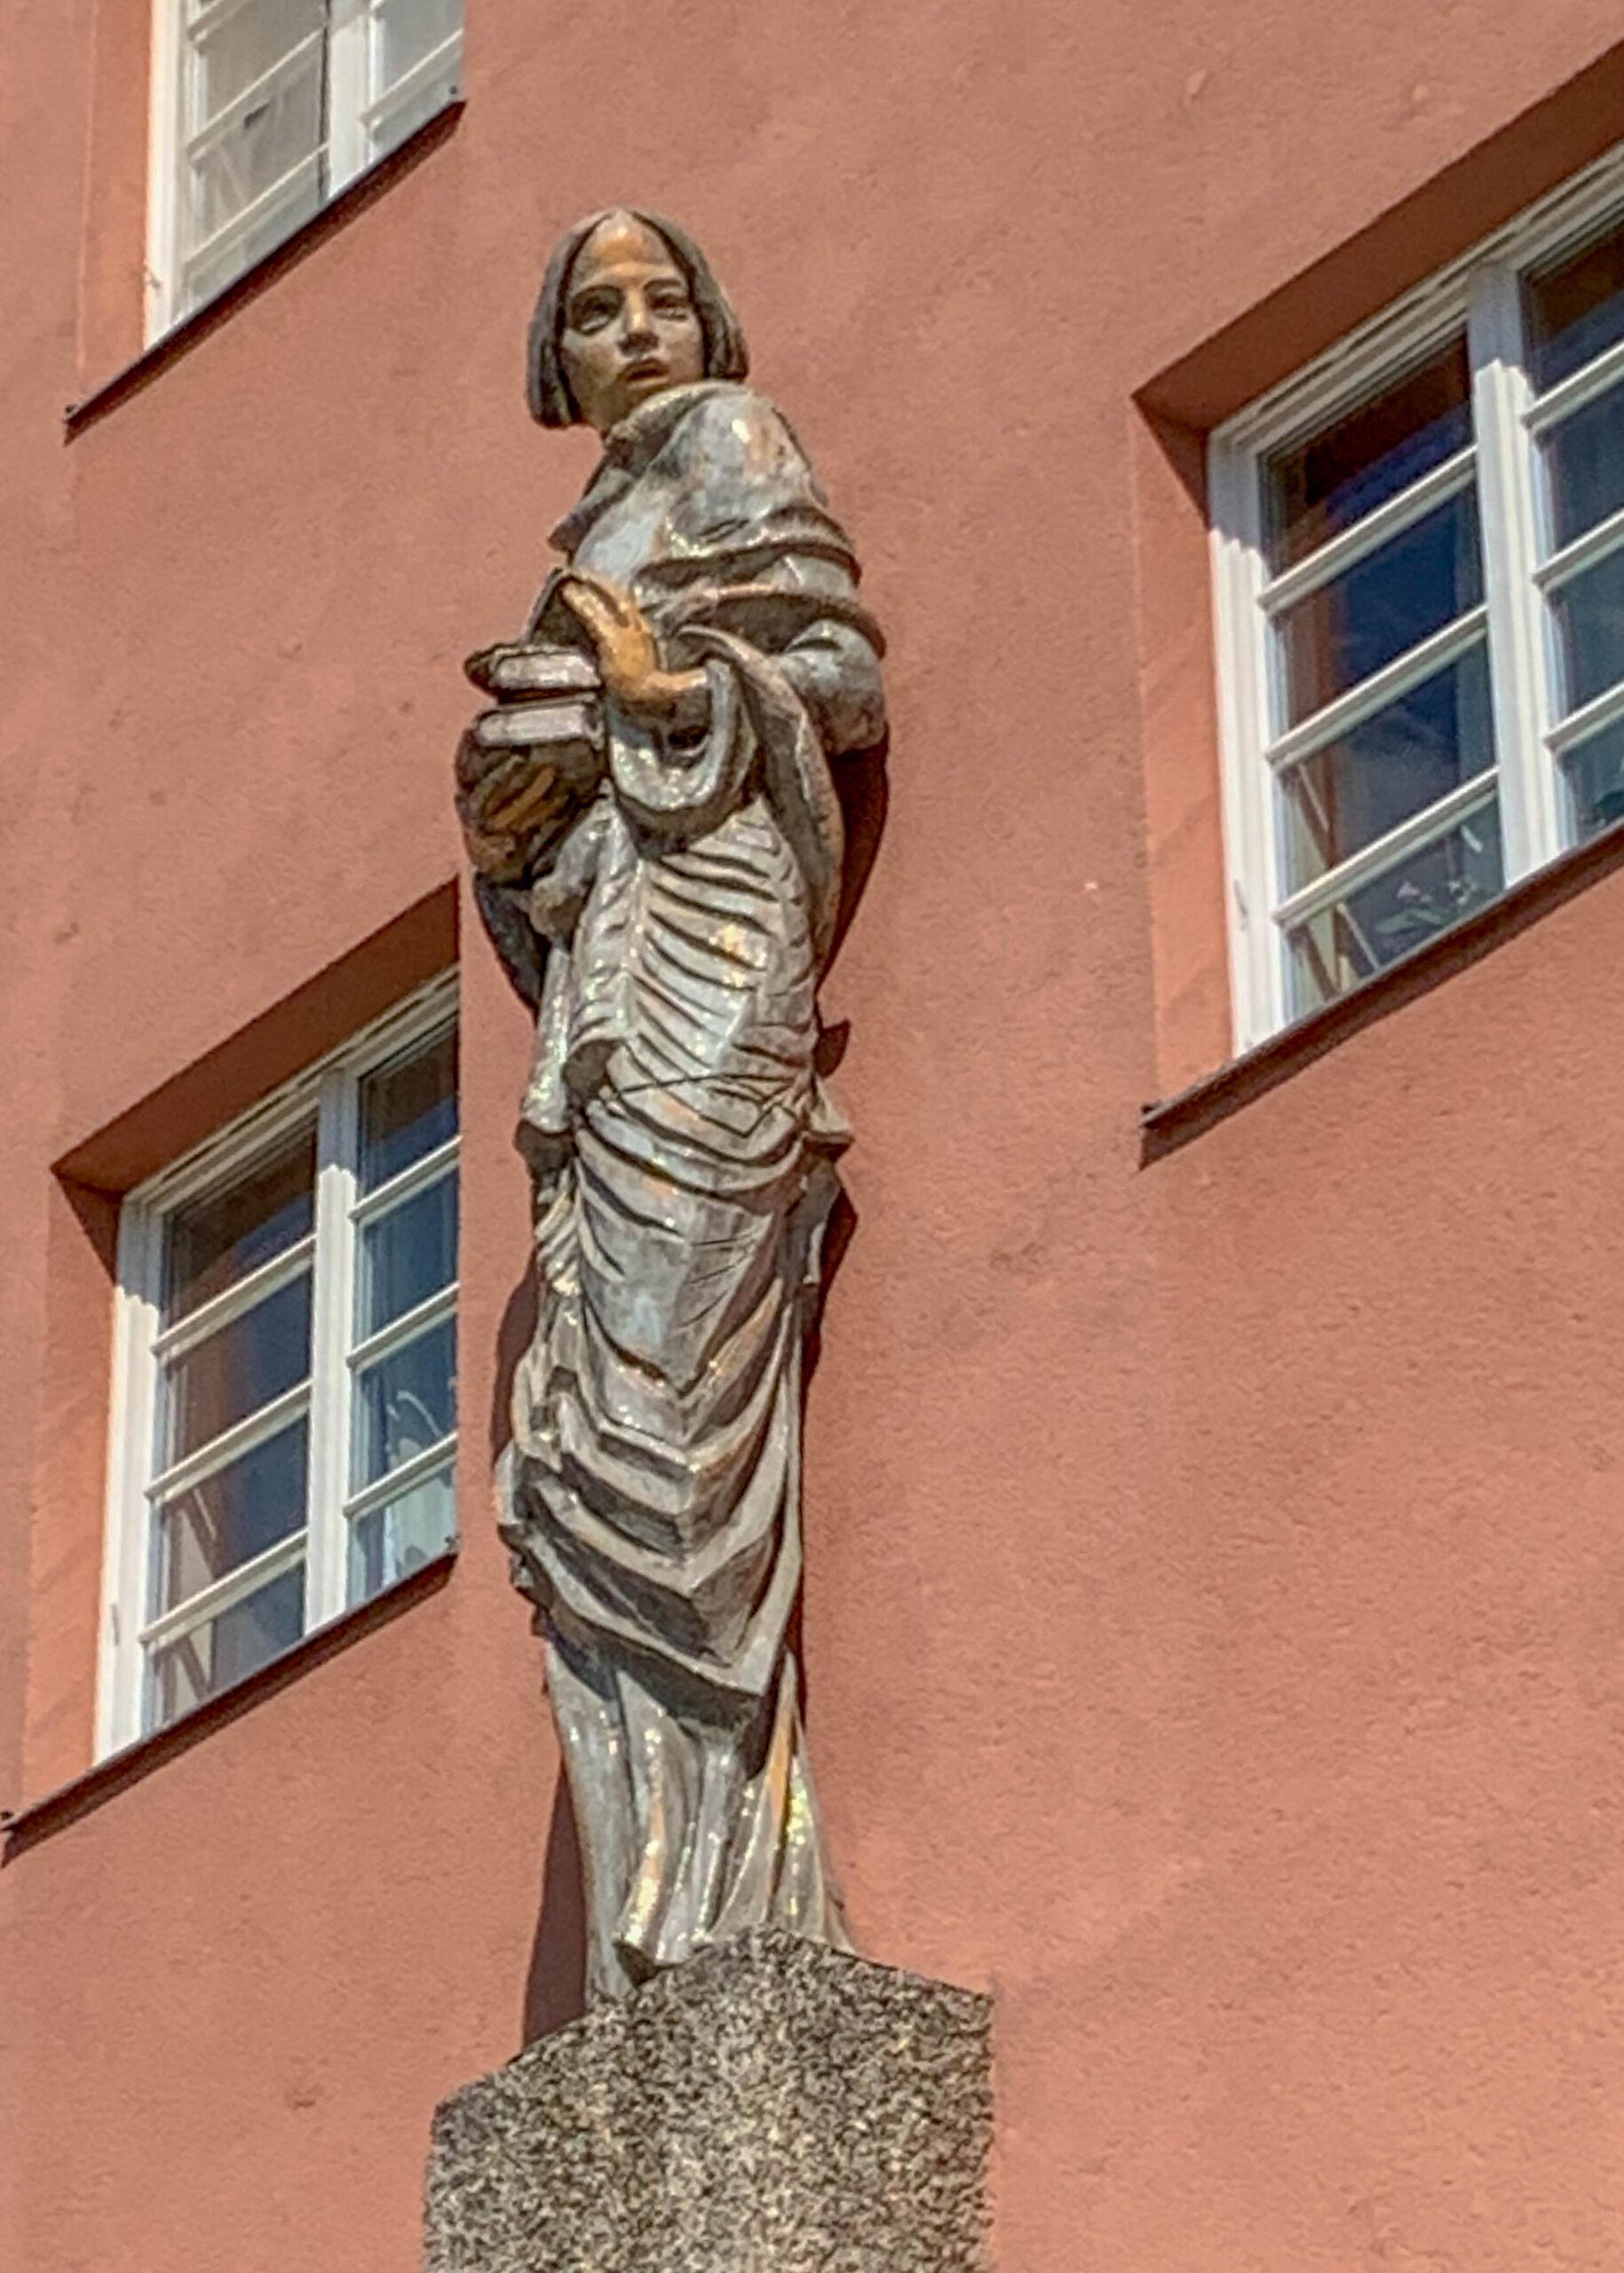 Karl-Marx-Hof, 1926-1930. Architect: Karl Ehn